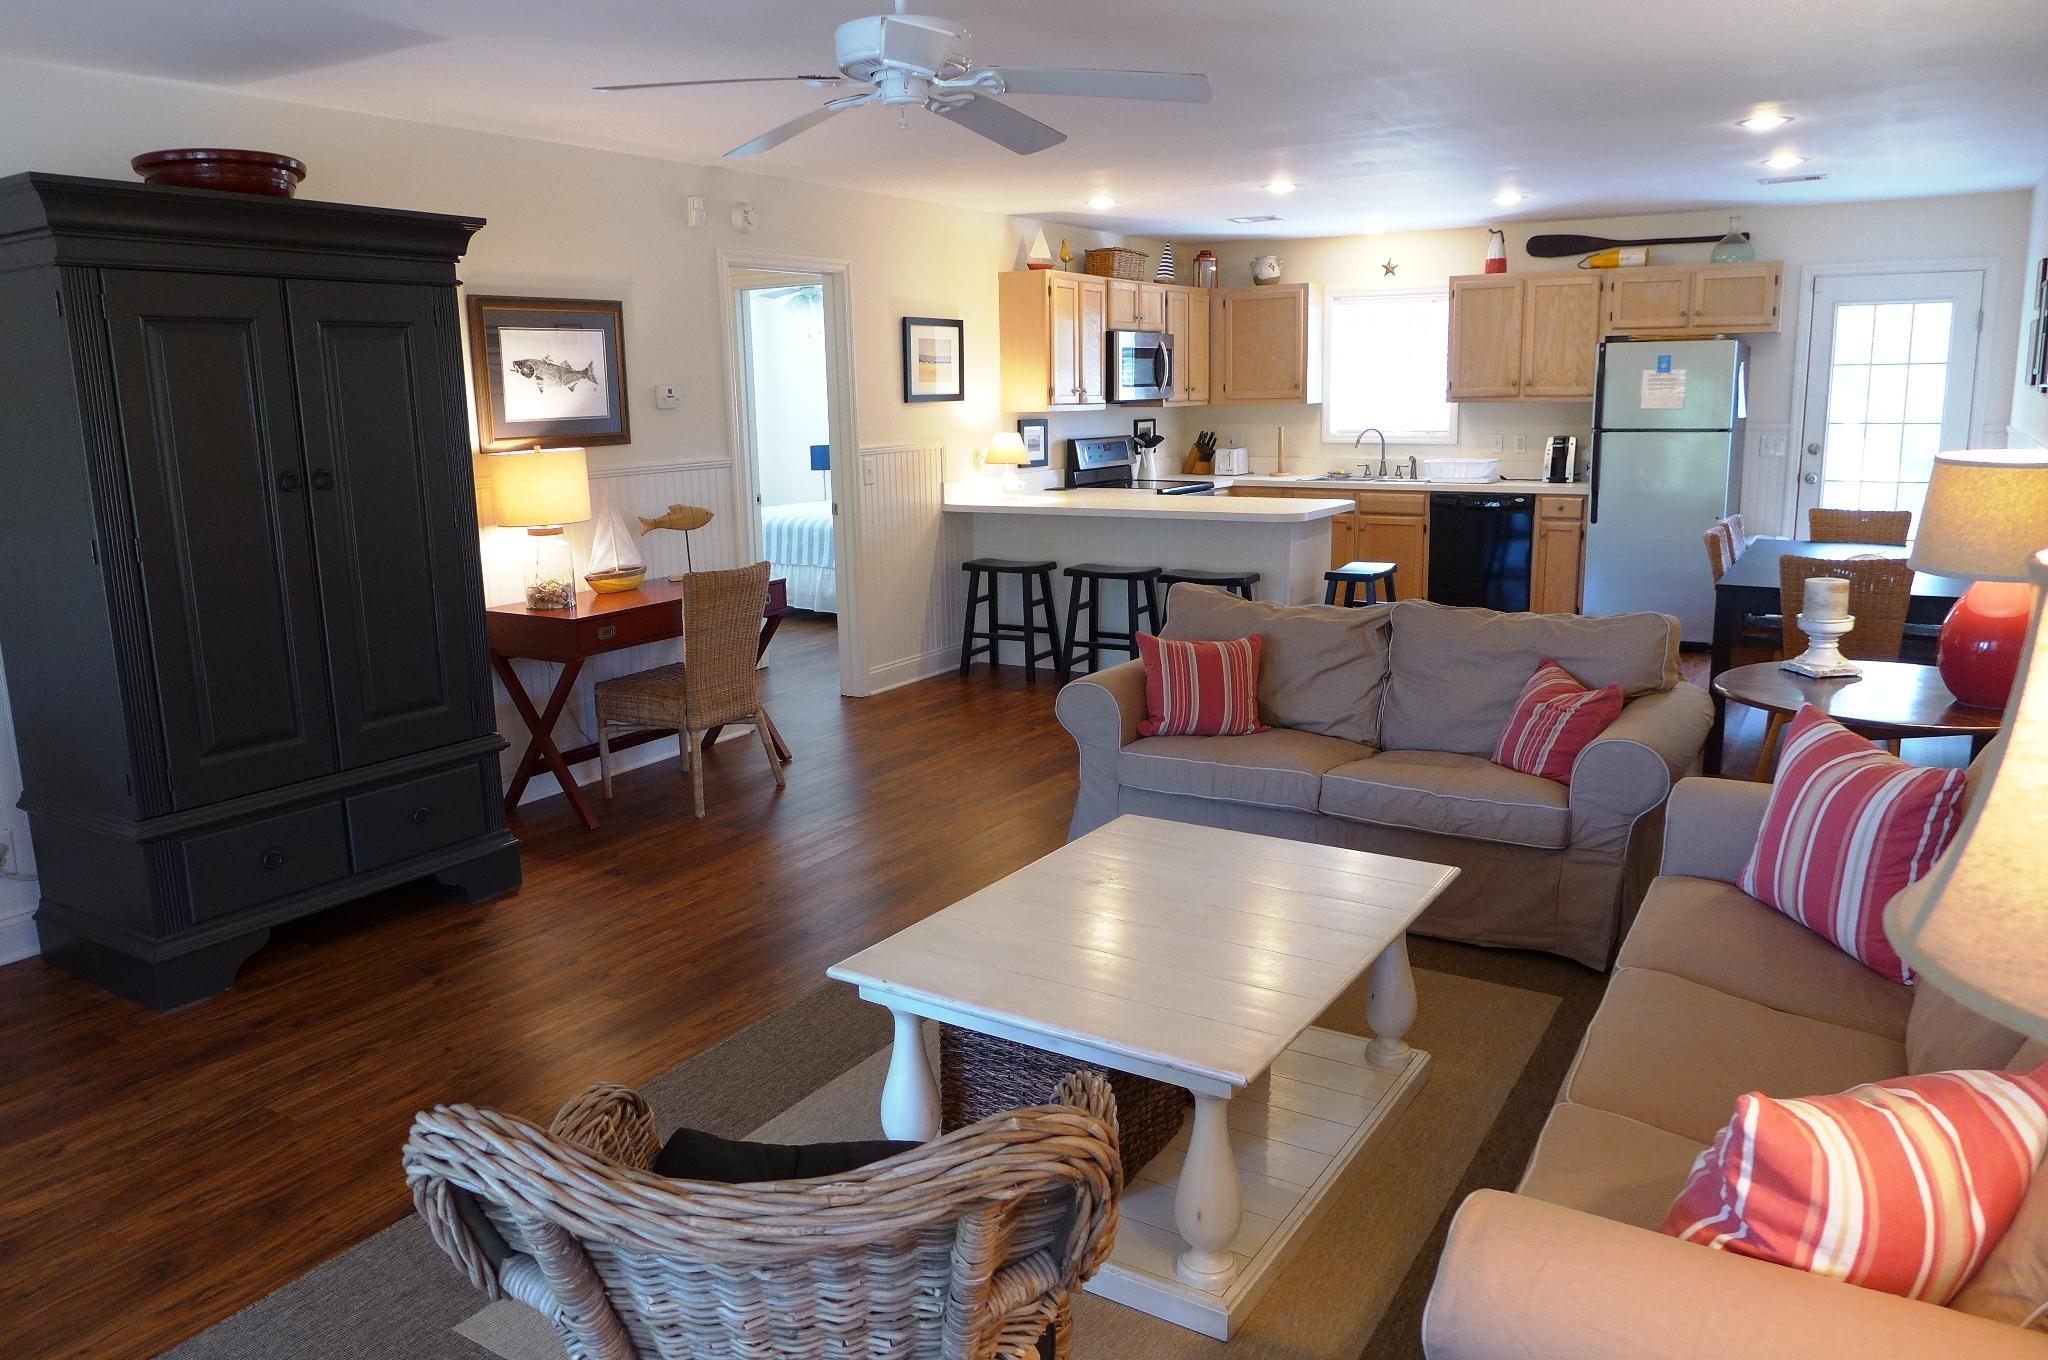 Edisto Beach Homes For Sale - 2202 Myrtle, Edisto Beach, SC - 16